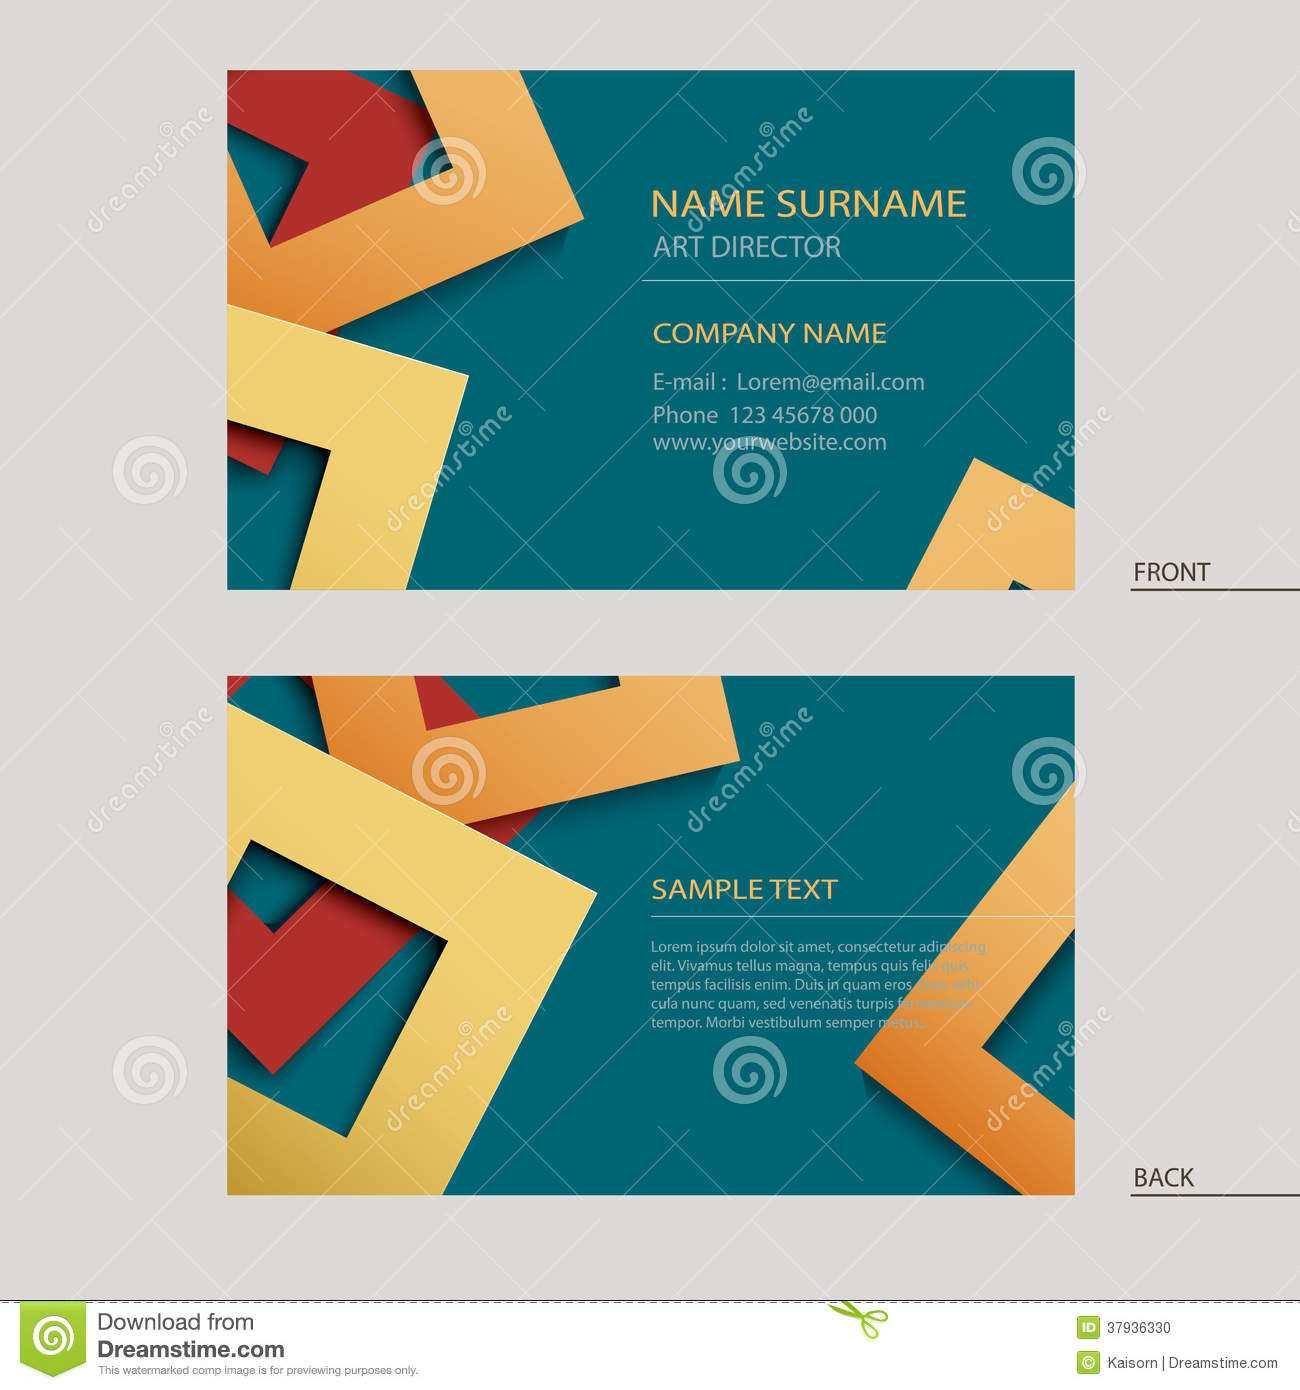 35 Customize Company Name Card Template PSD File by Company Name Card Template